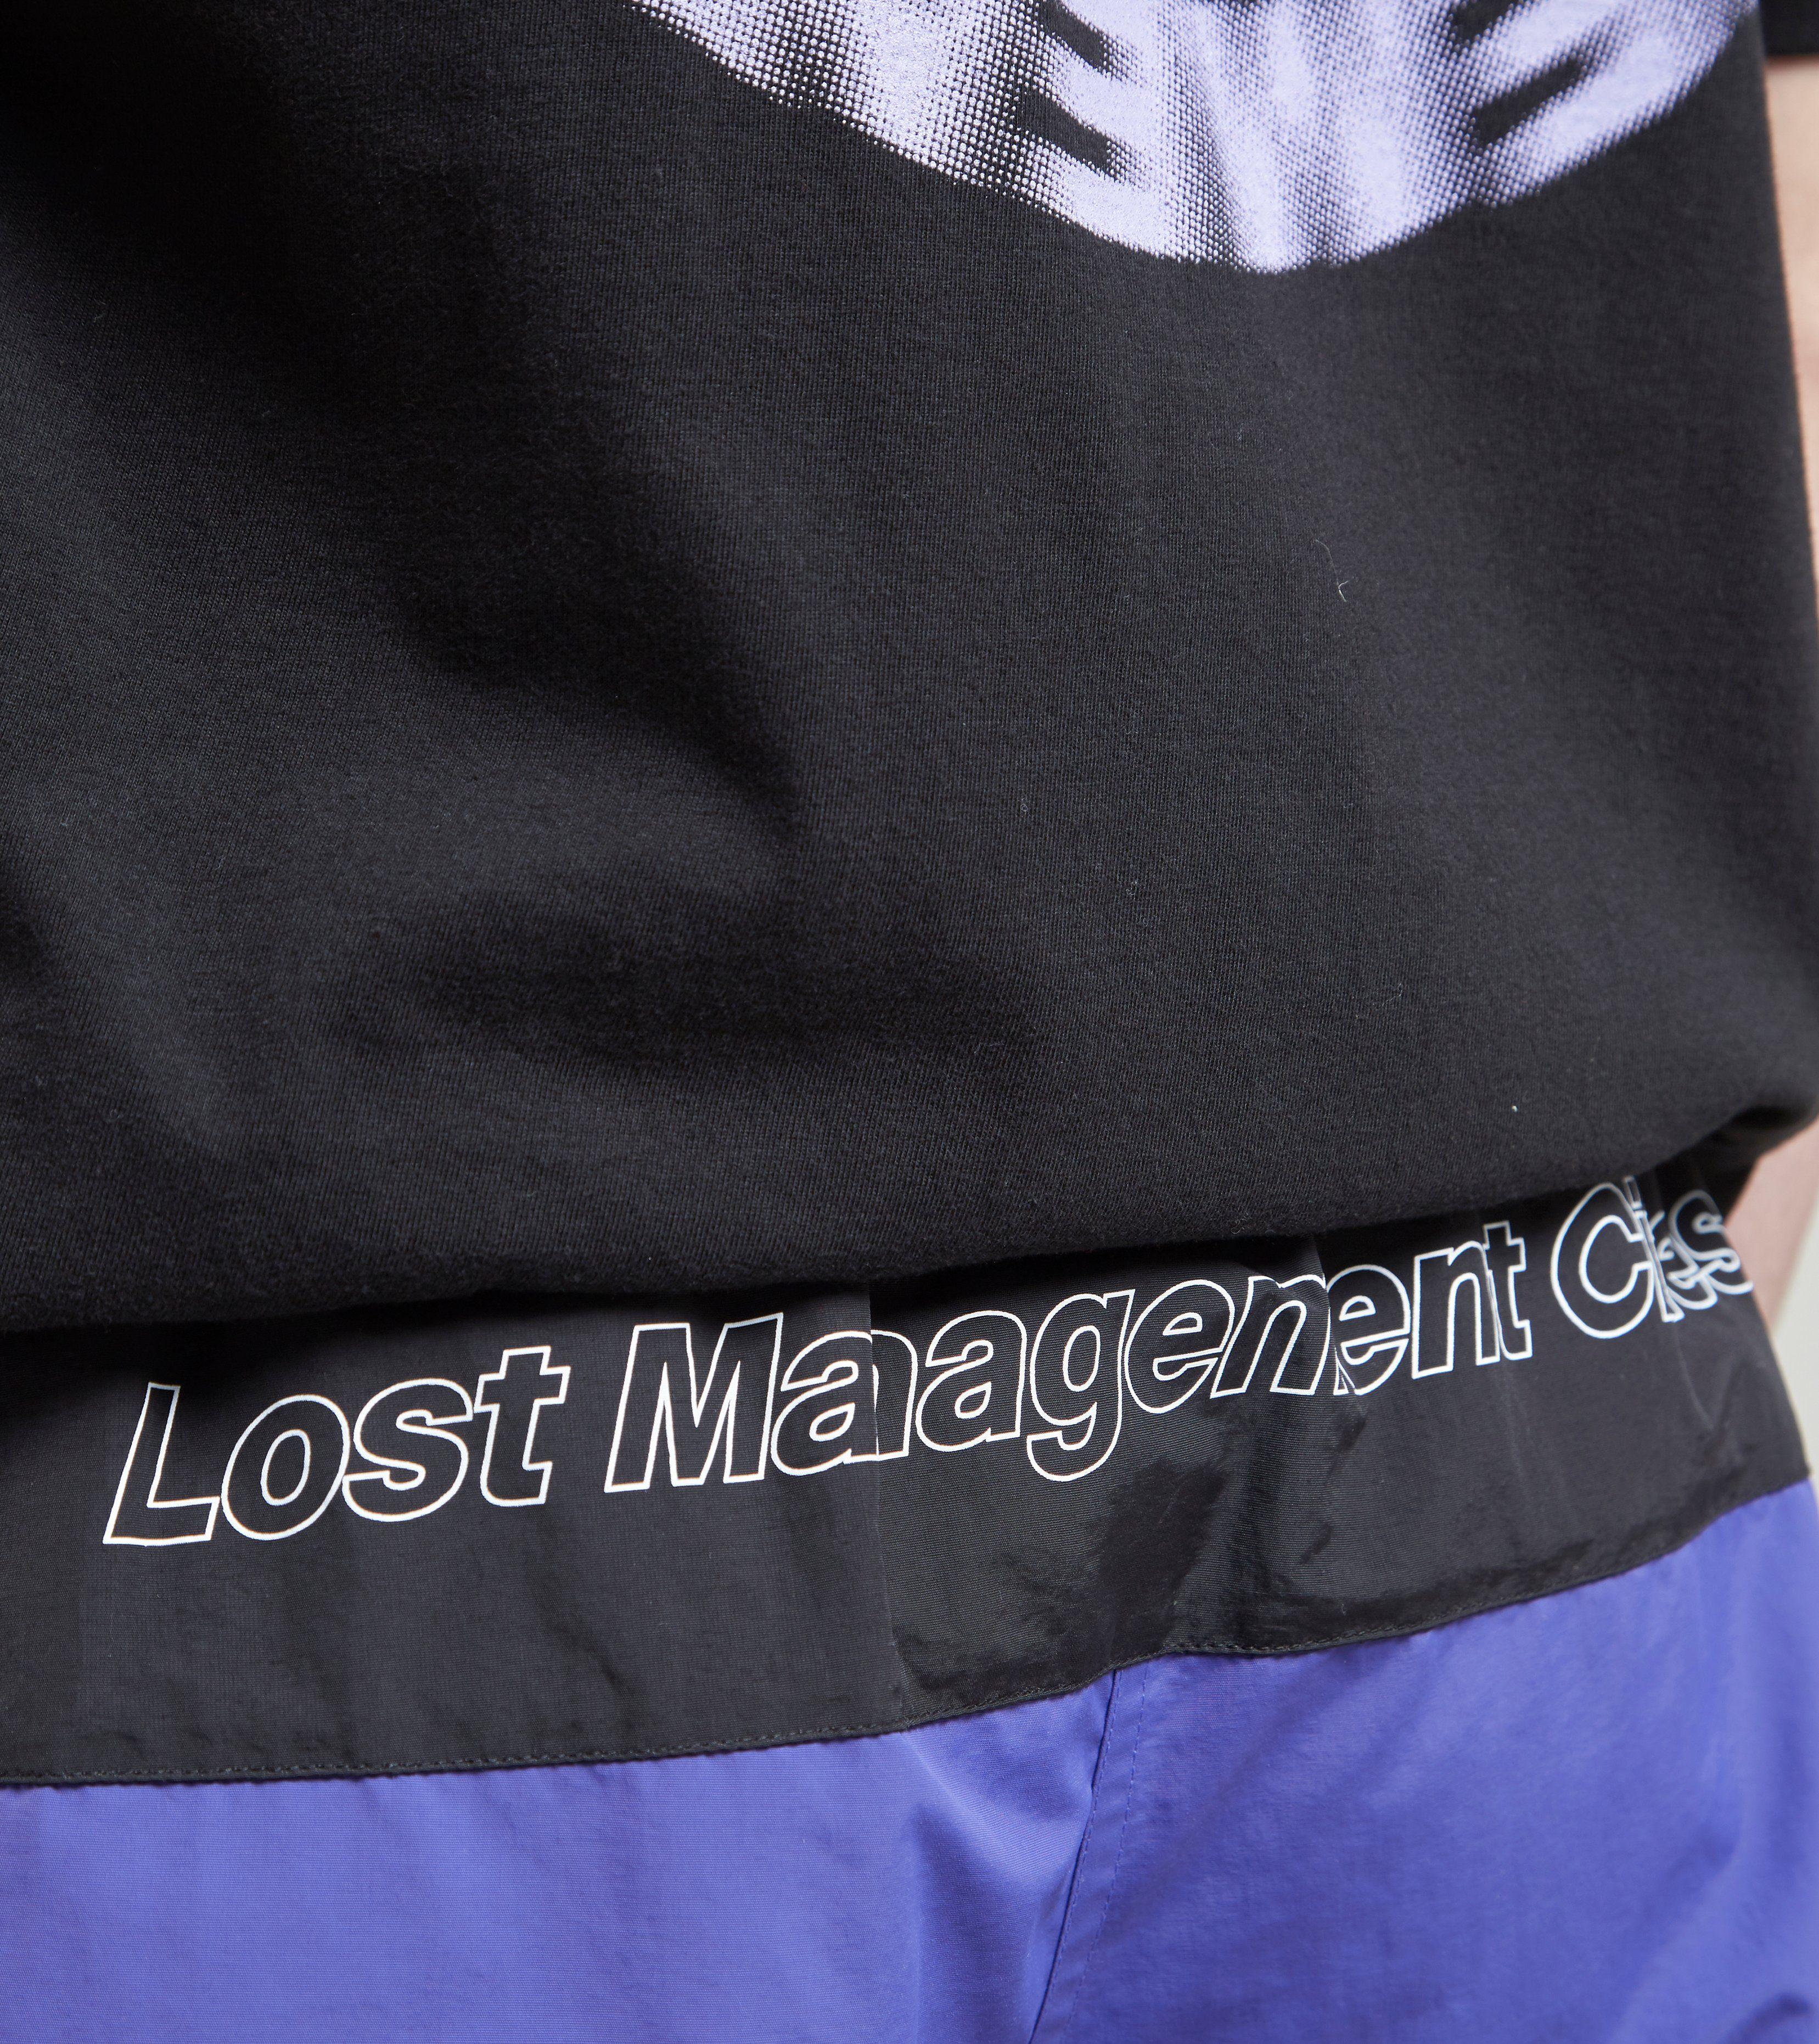 Lost Management Cities Block Team Shorts